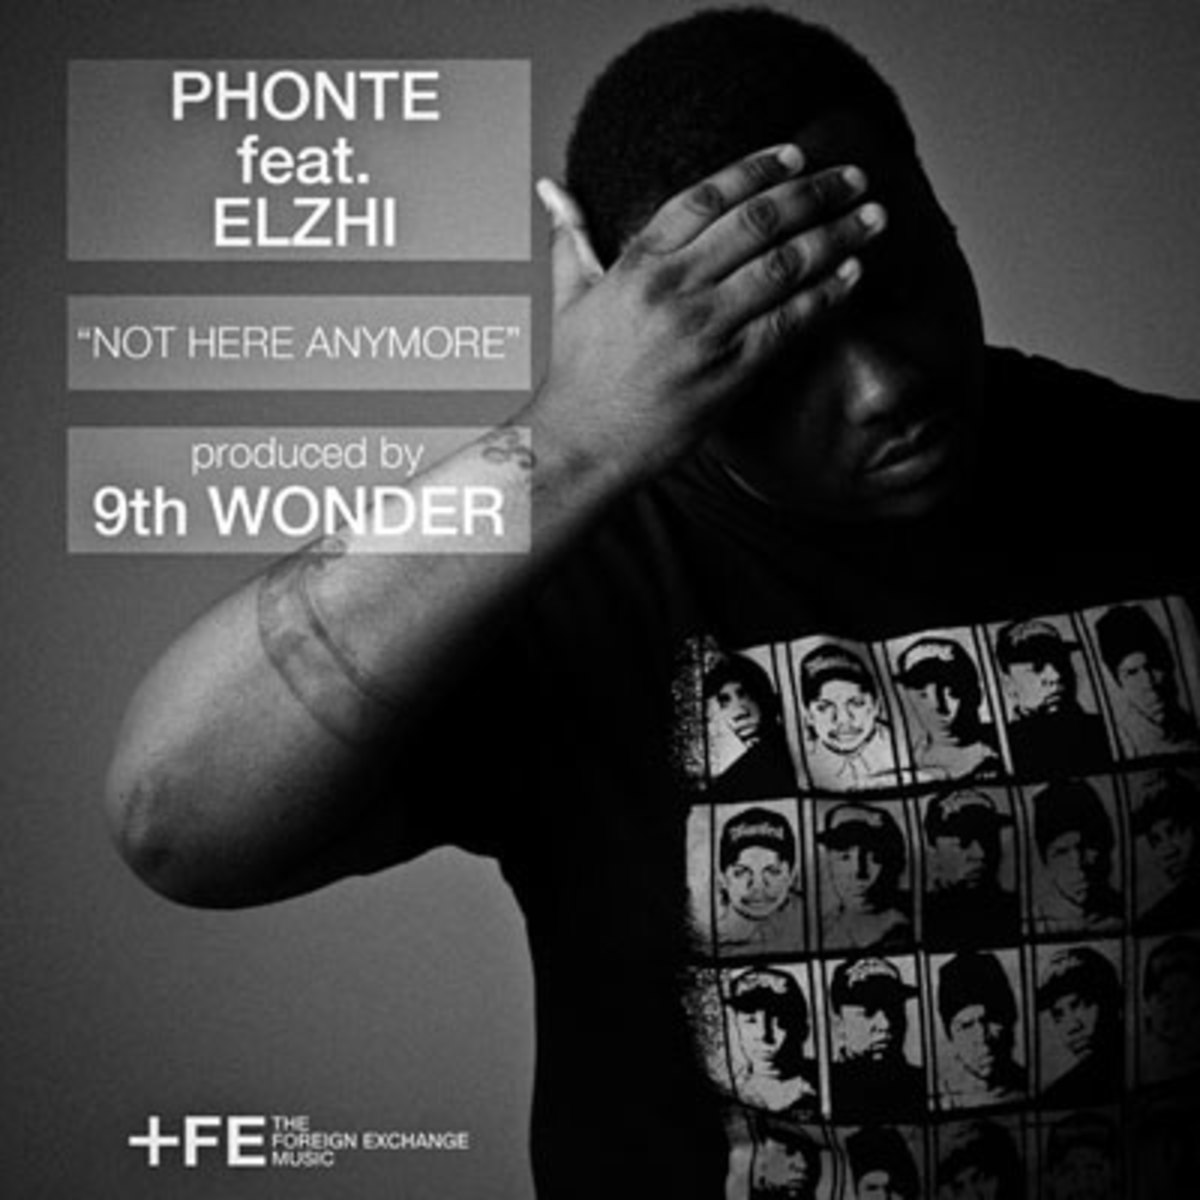 phonte-nothereanymore.jpg